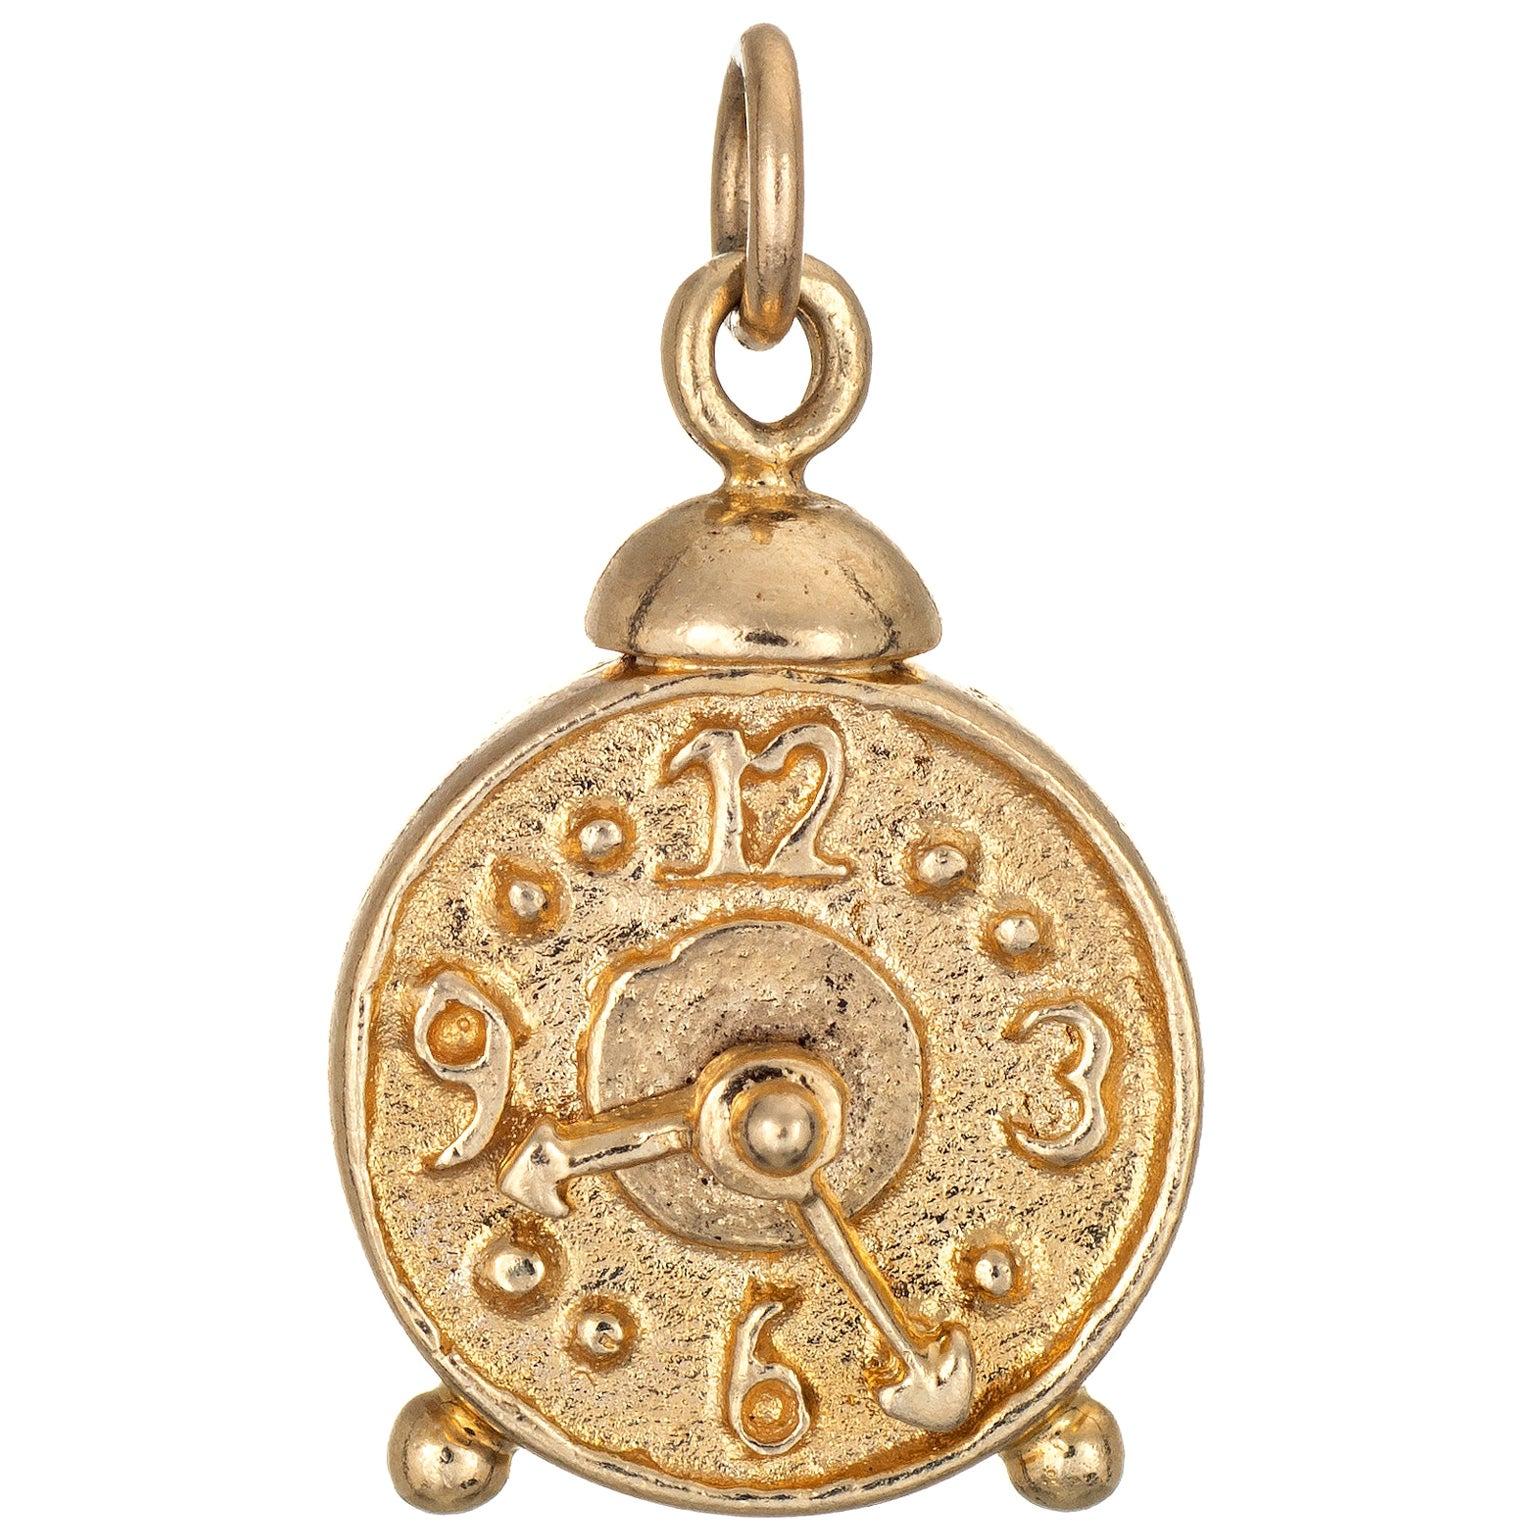 Alarm Clock Charm 14 Karat Yellow Gold Number Dial Estate Jewelry Pendant